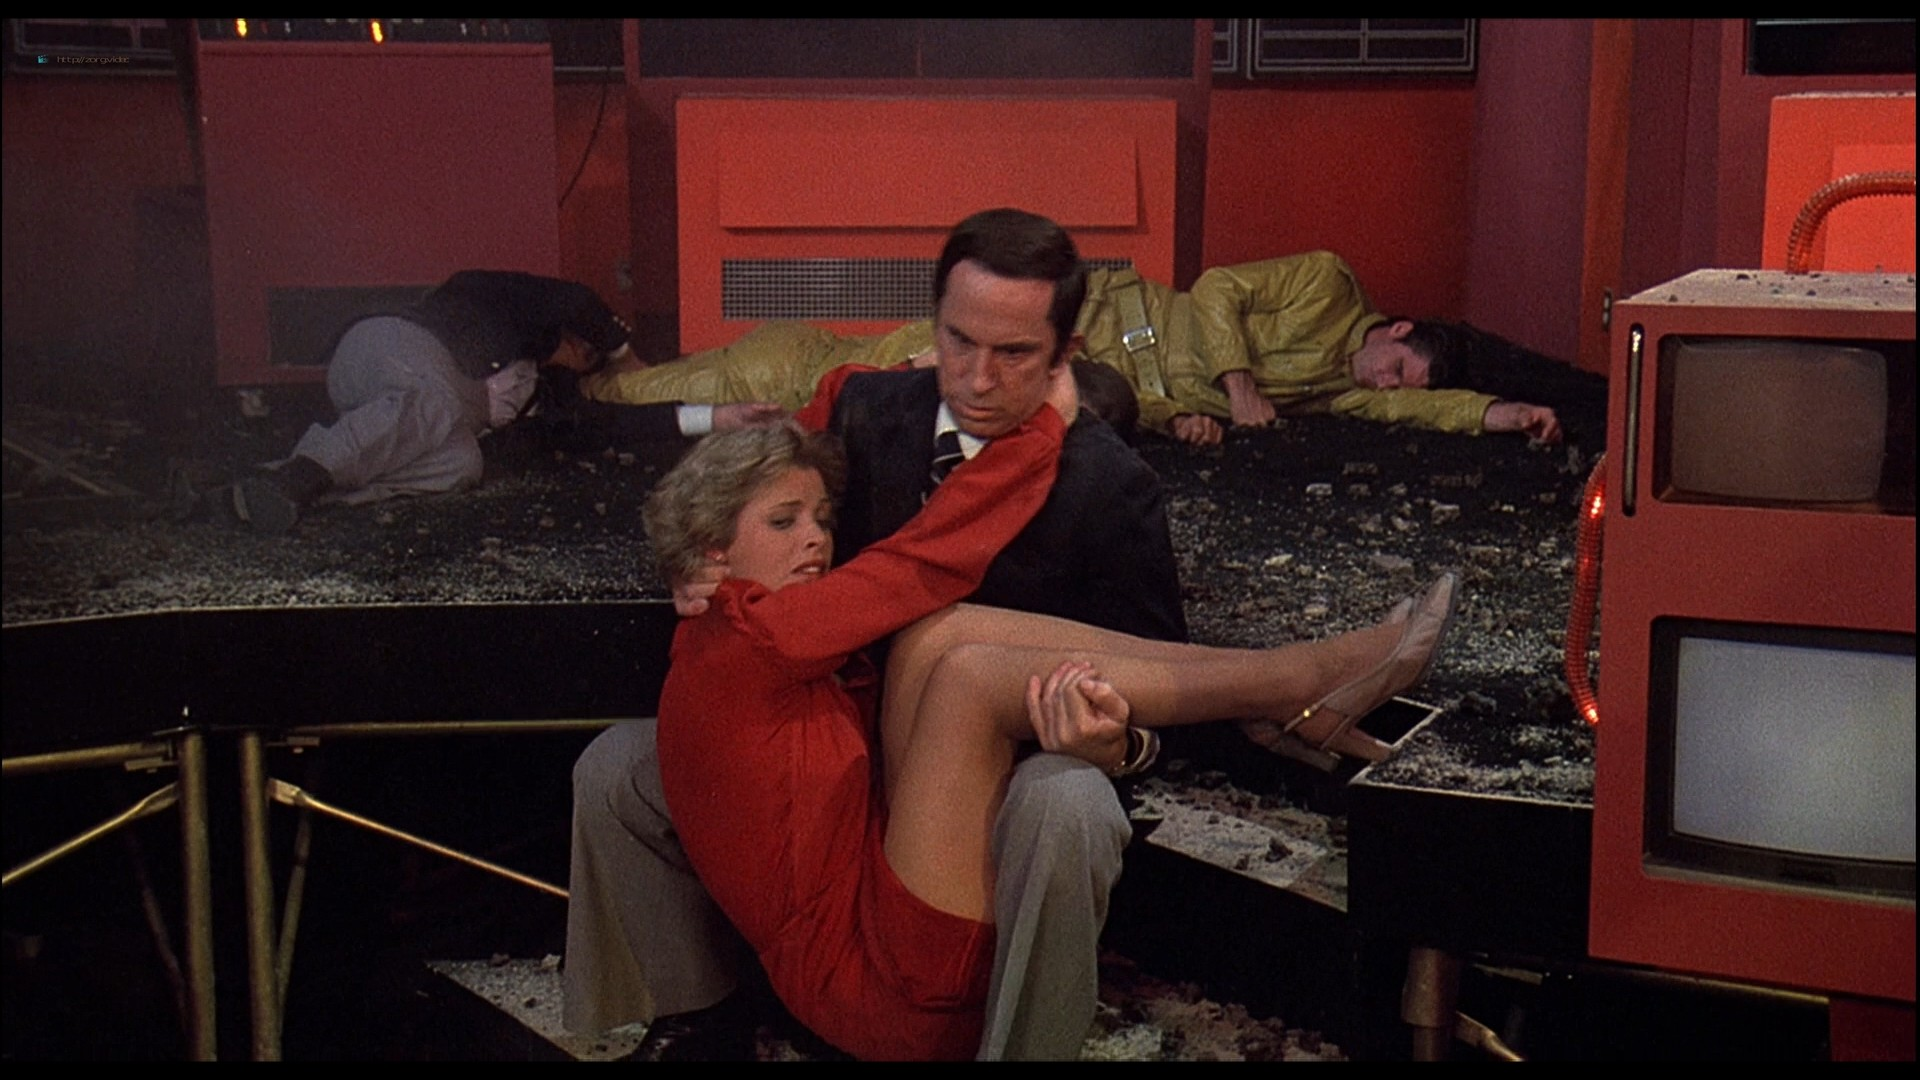 Cheré Bryson busty see through Andrea Howard, Pamela Hensley hot - The Nude Bomb (1980) HD 1080p BluRay (3)